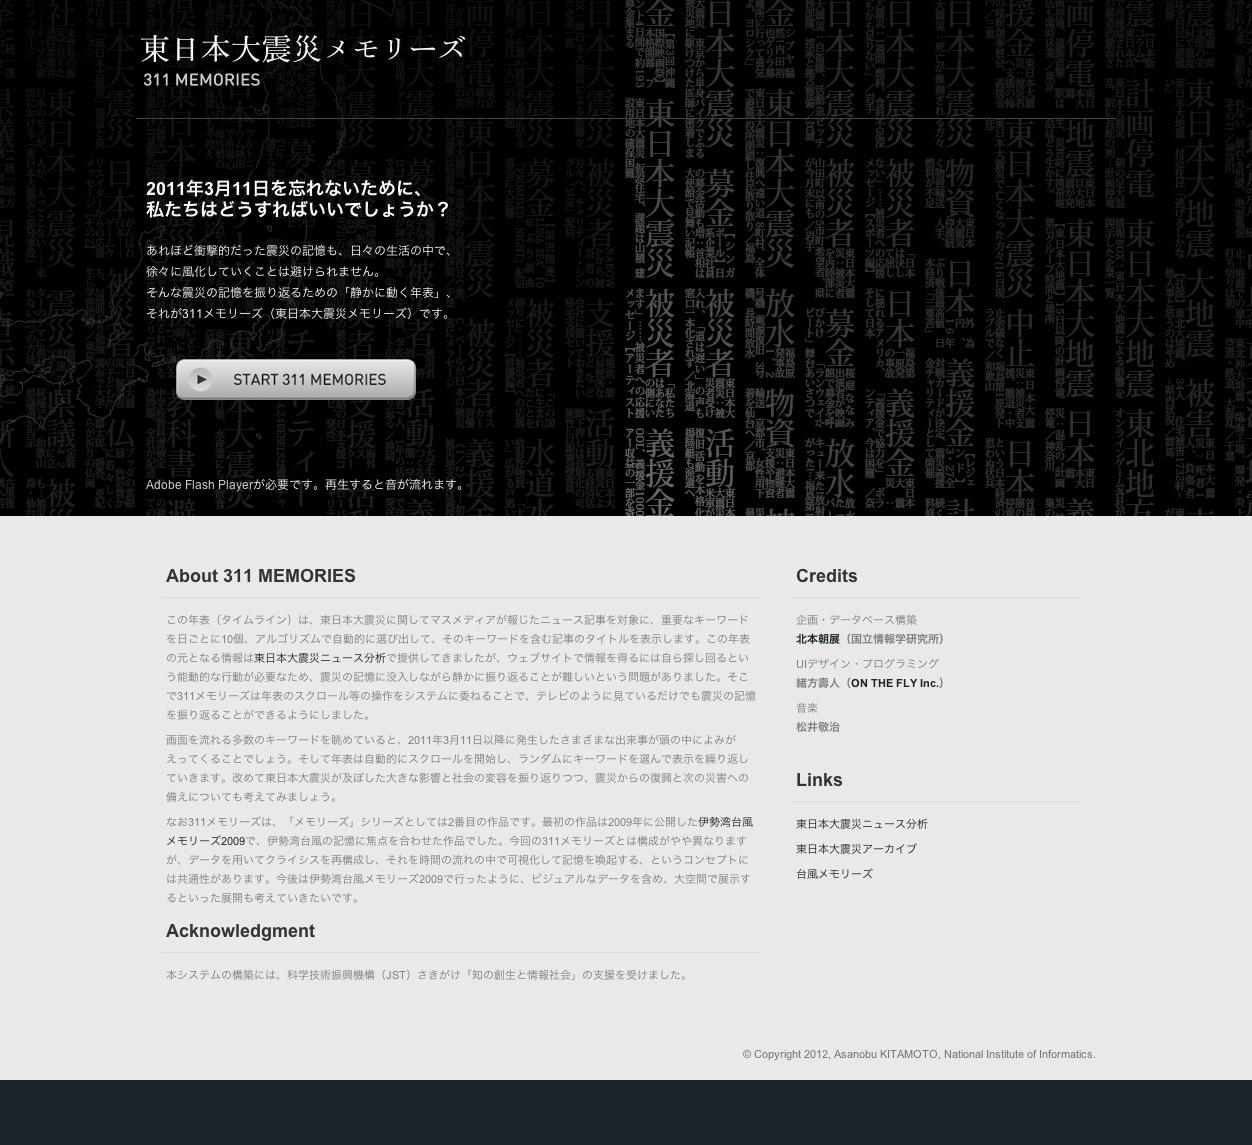 東日本大震災メモリーズ_b0060102_23595723.jpg